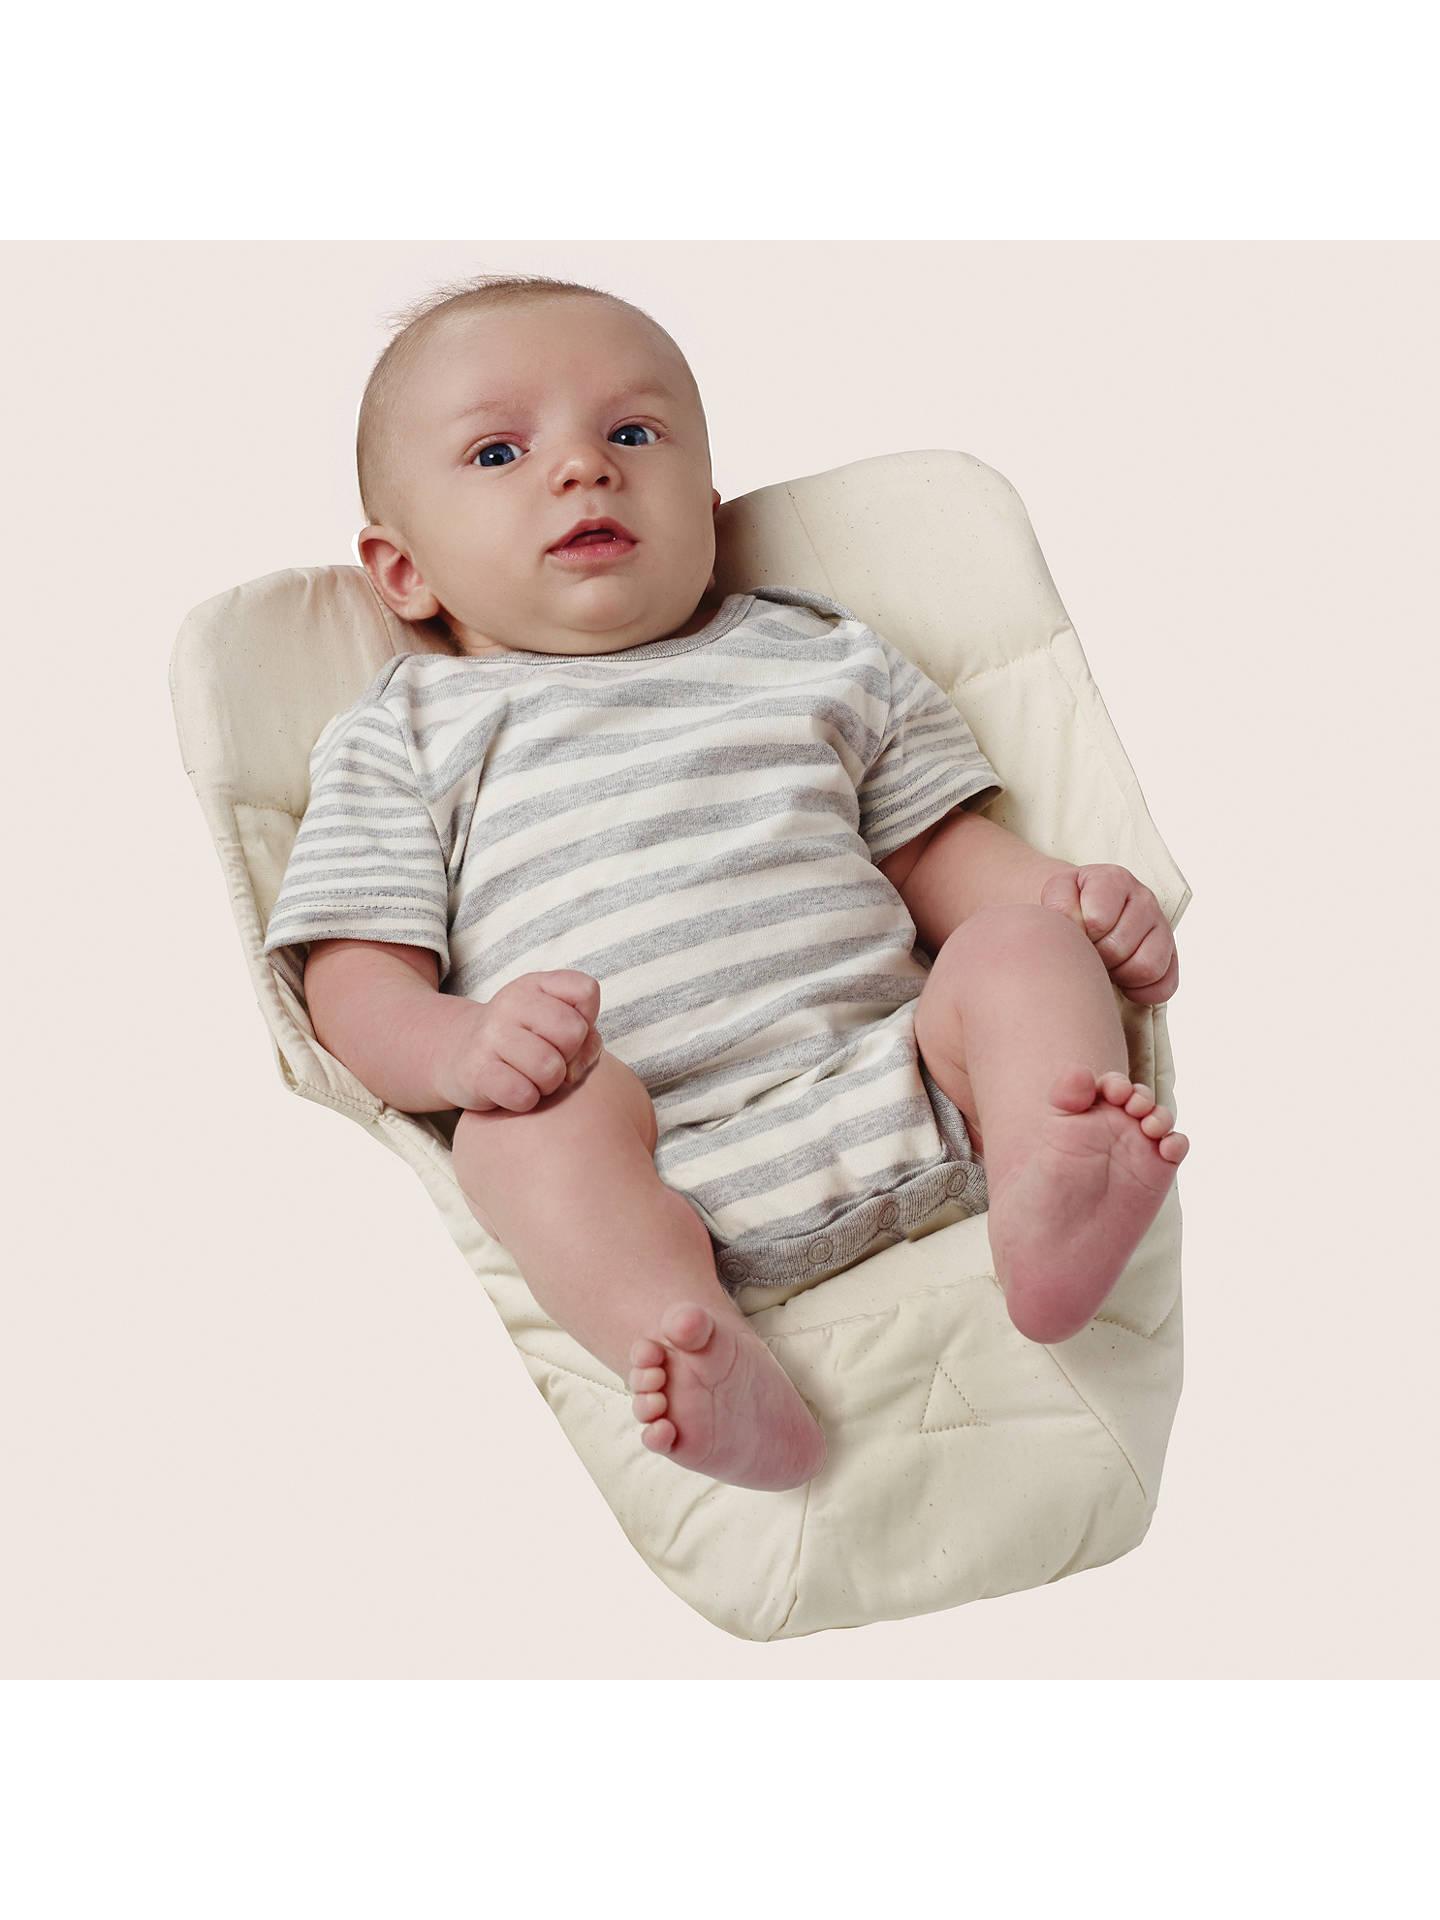 e8a5edaf208 ... Buy Ergobaby Baby Carrier Infant Insert